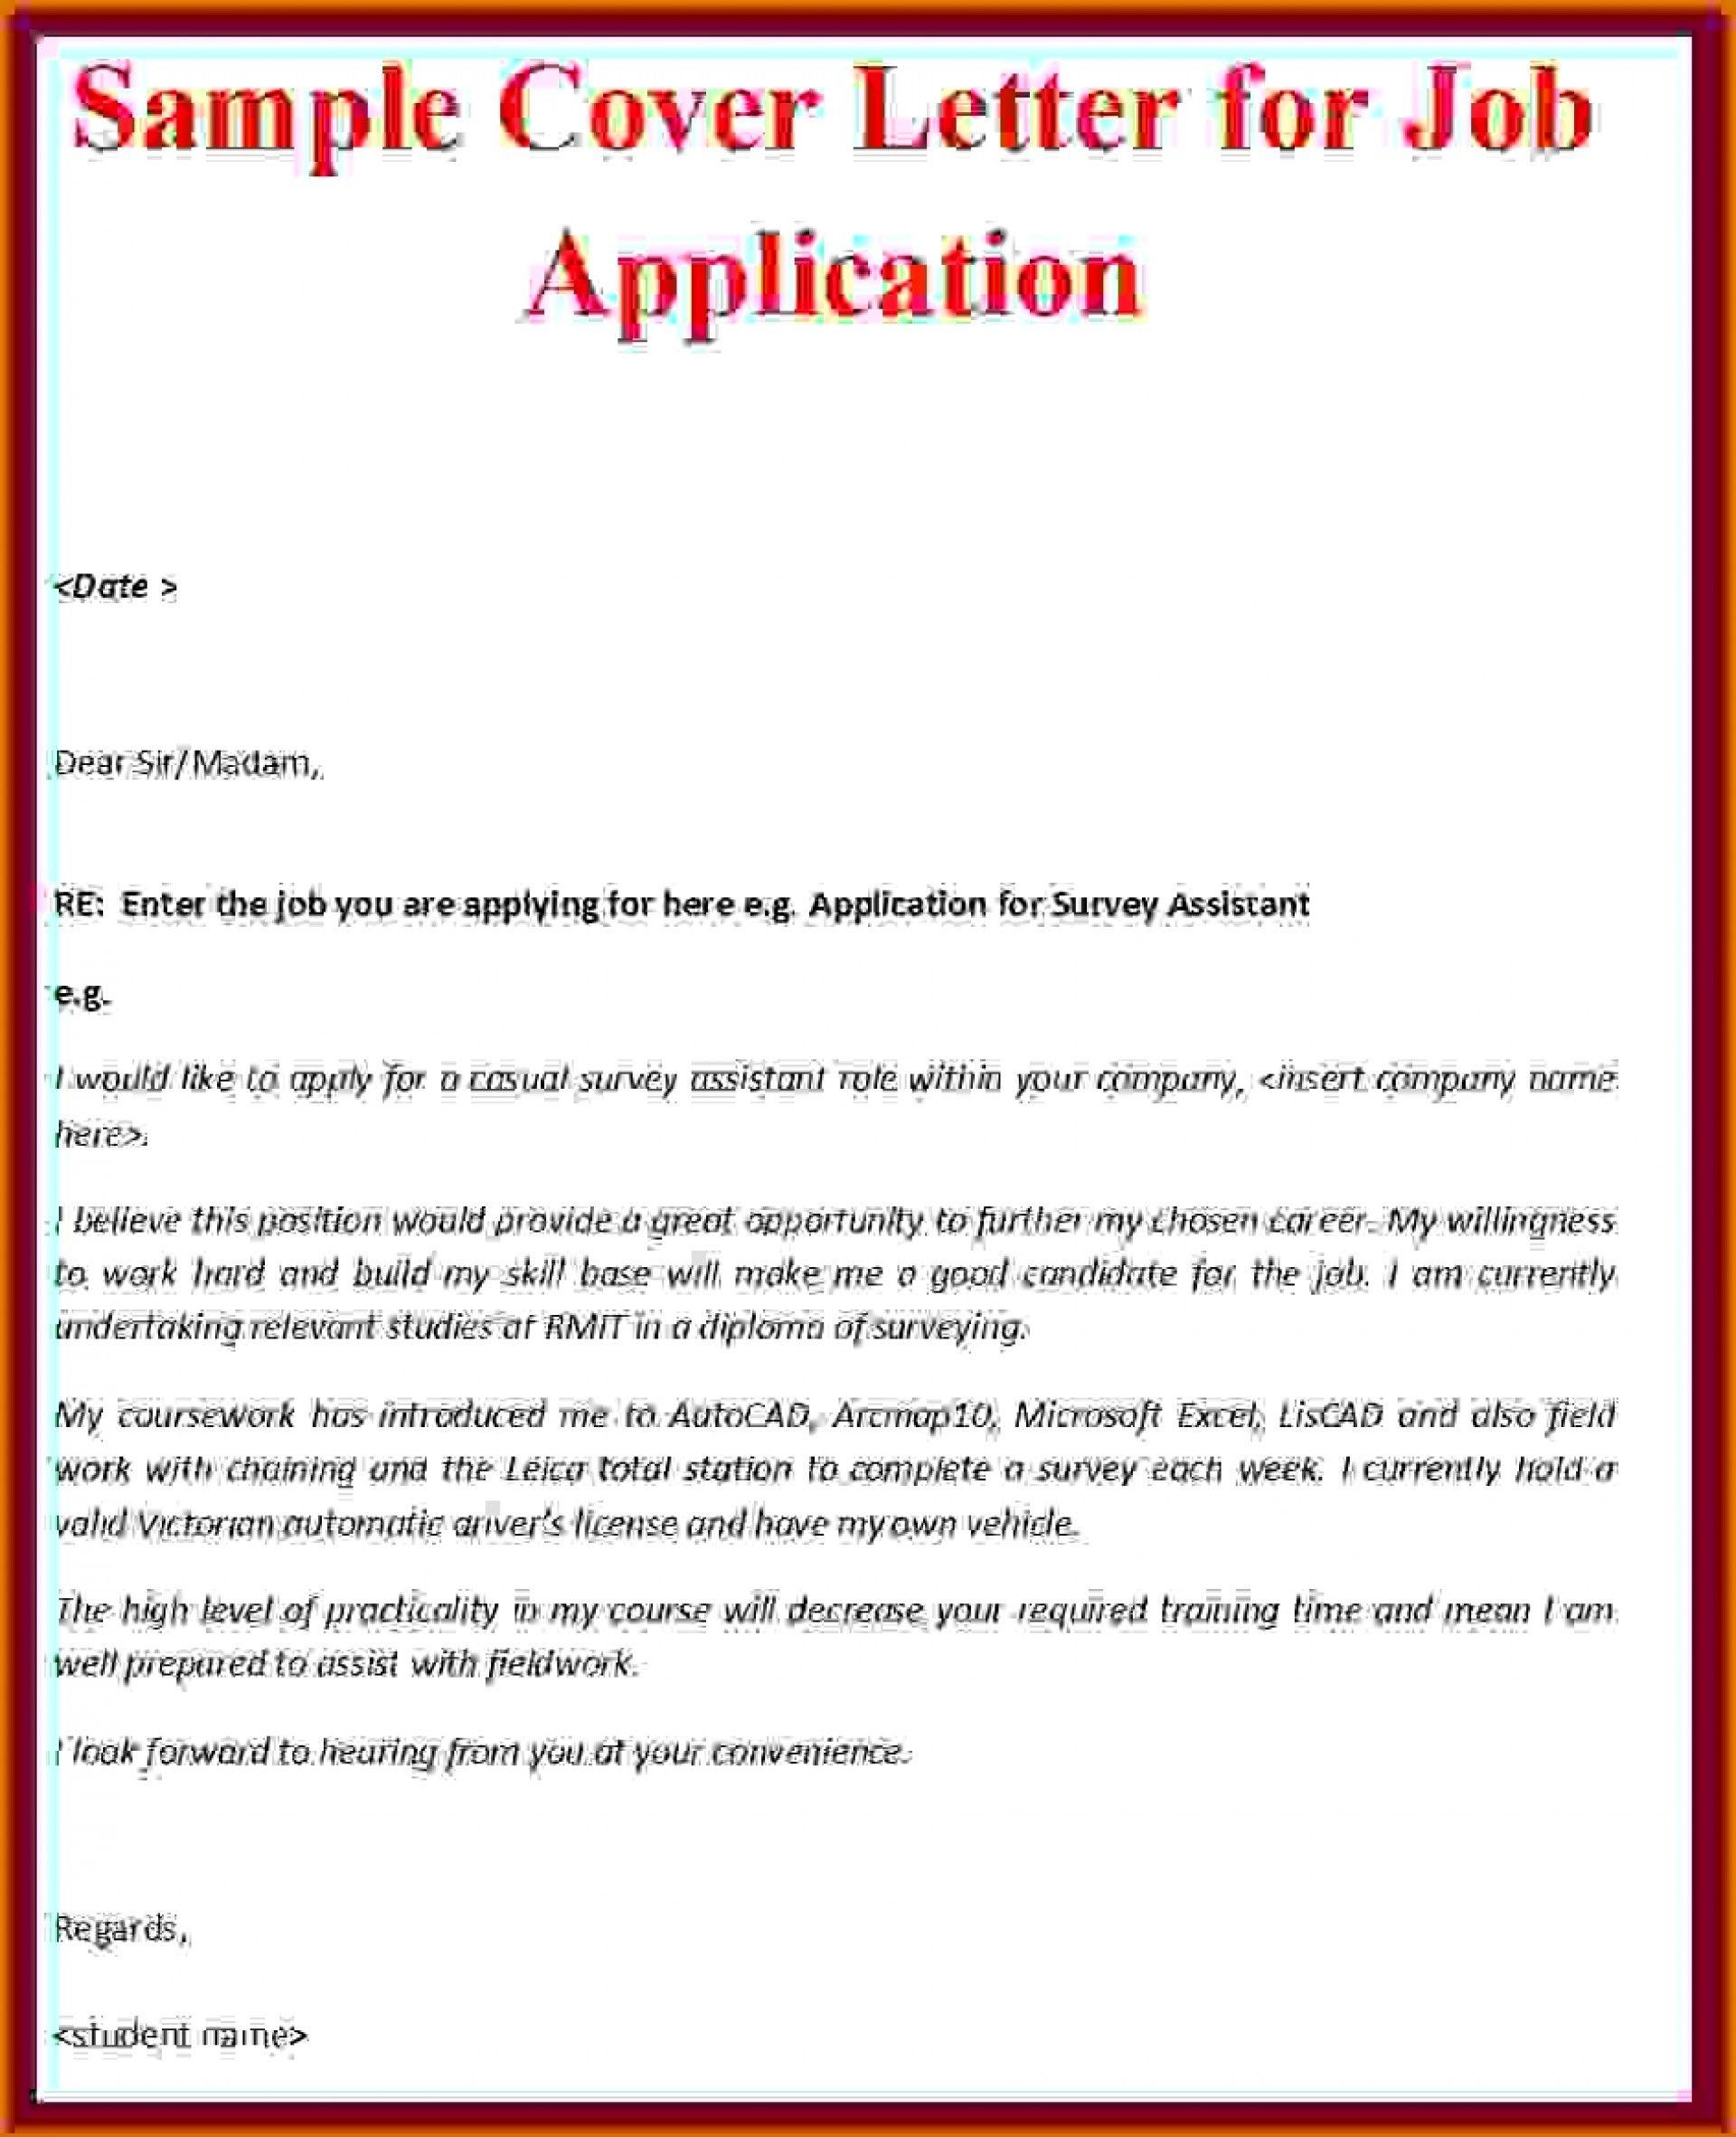 30 Cover Letter For Job Application In 2020 Job Cover Letter Cover Letter For Resume Job Application Cover Letter